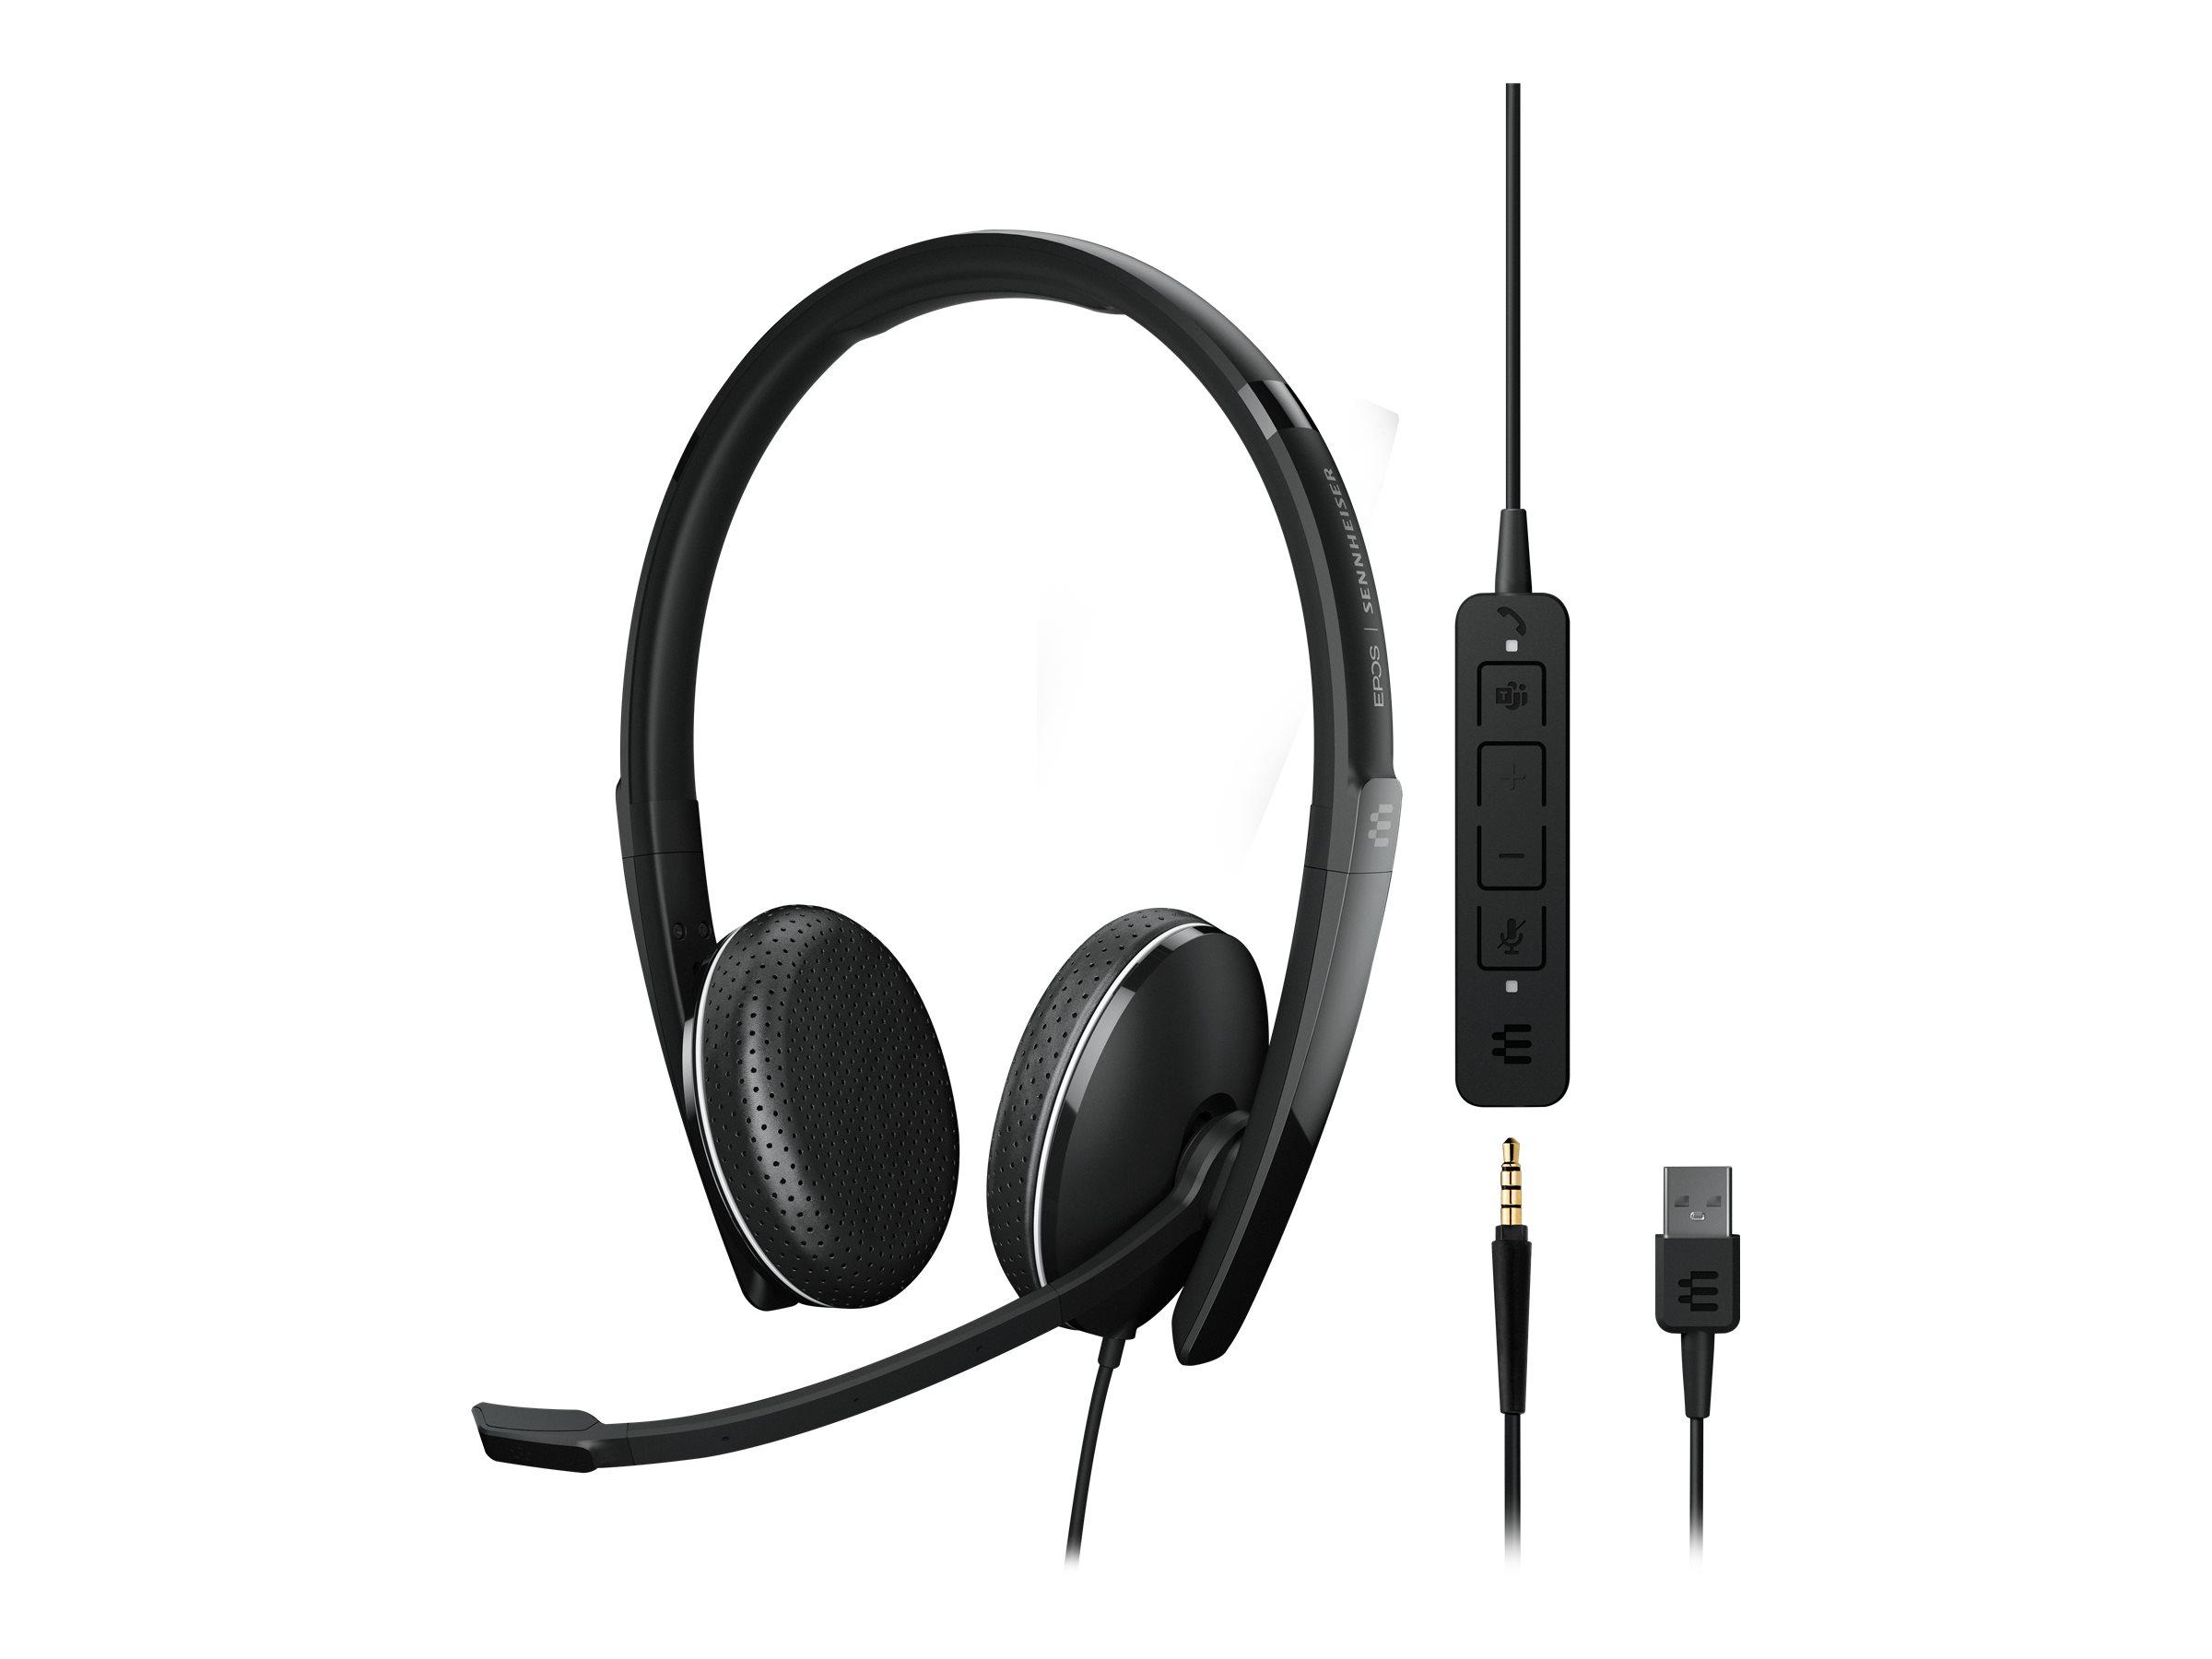 EPOS I SENNHEISER ADAPT 165T USB II - ADAPT 100 Series - Headset - On-Ear - kabelgebunden - 3,5 mm Stecker, USB-A